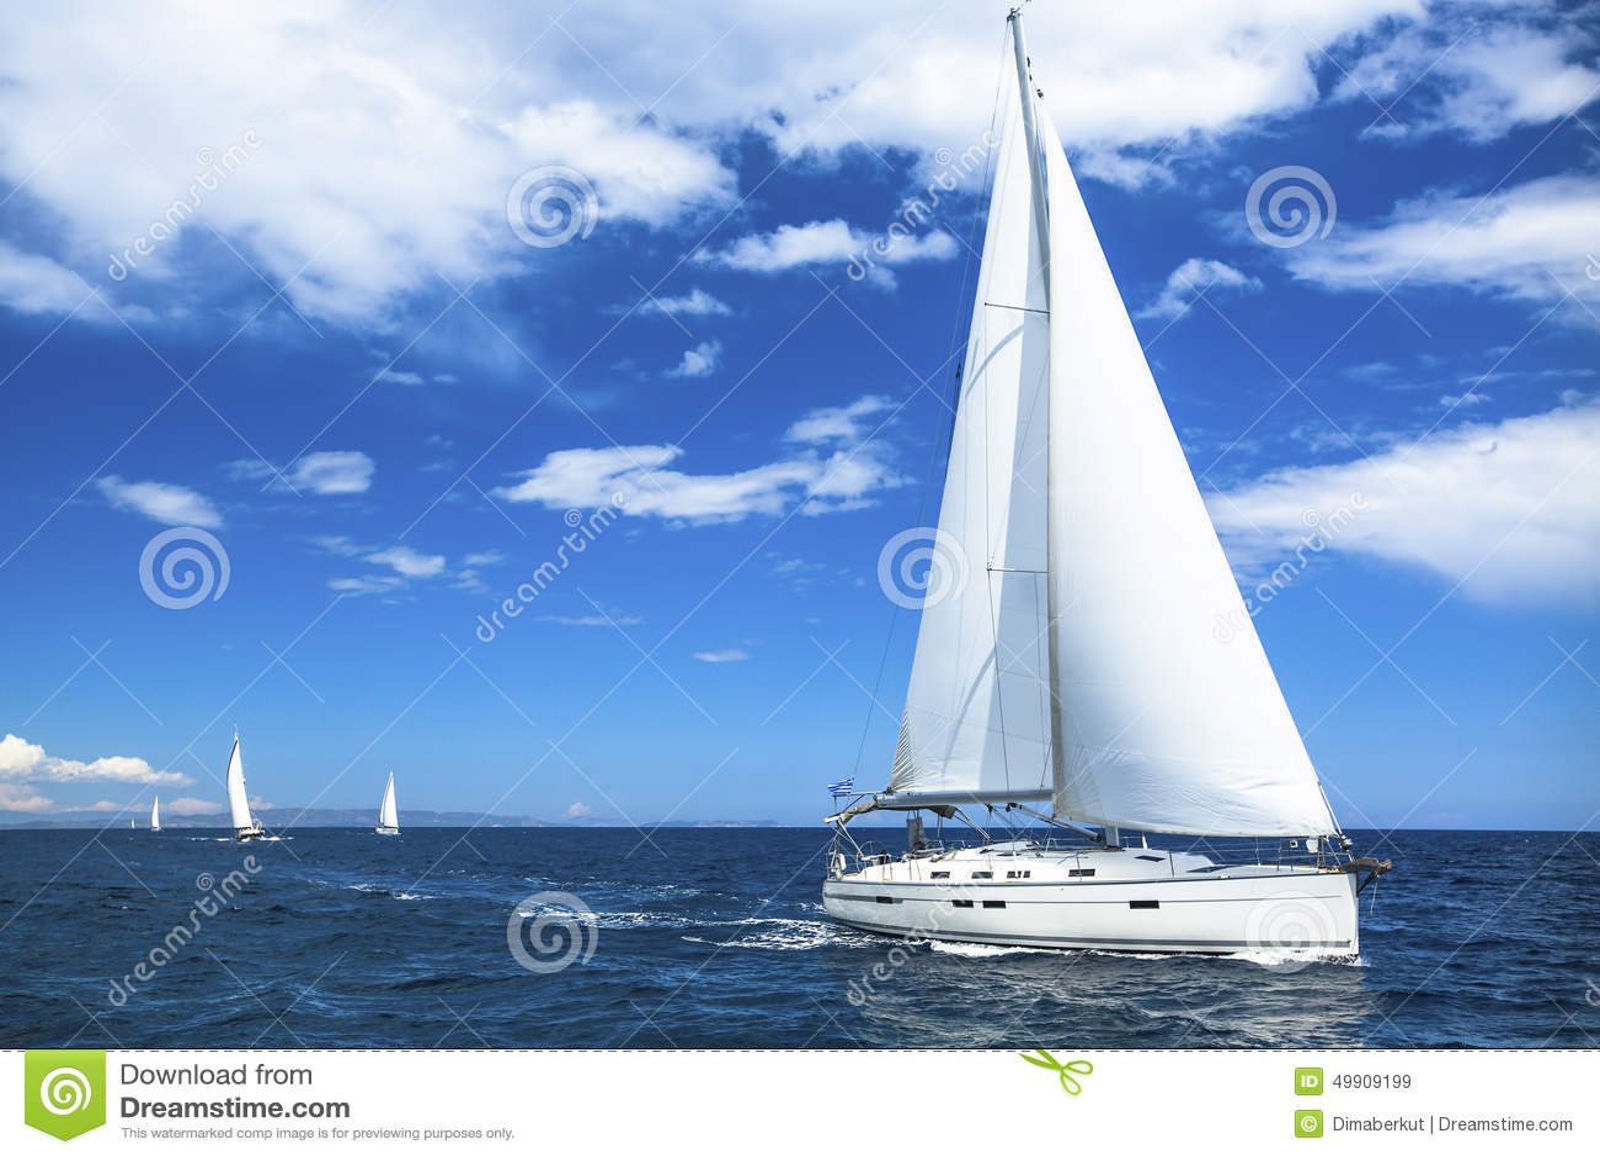 Sailing Boat Yacht Or Sail Regatta Race On Blue Water Sea. Sport. Stock Photo - Image: 49909199